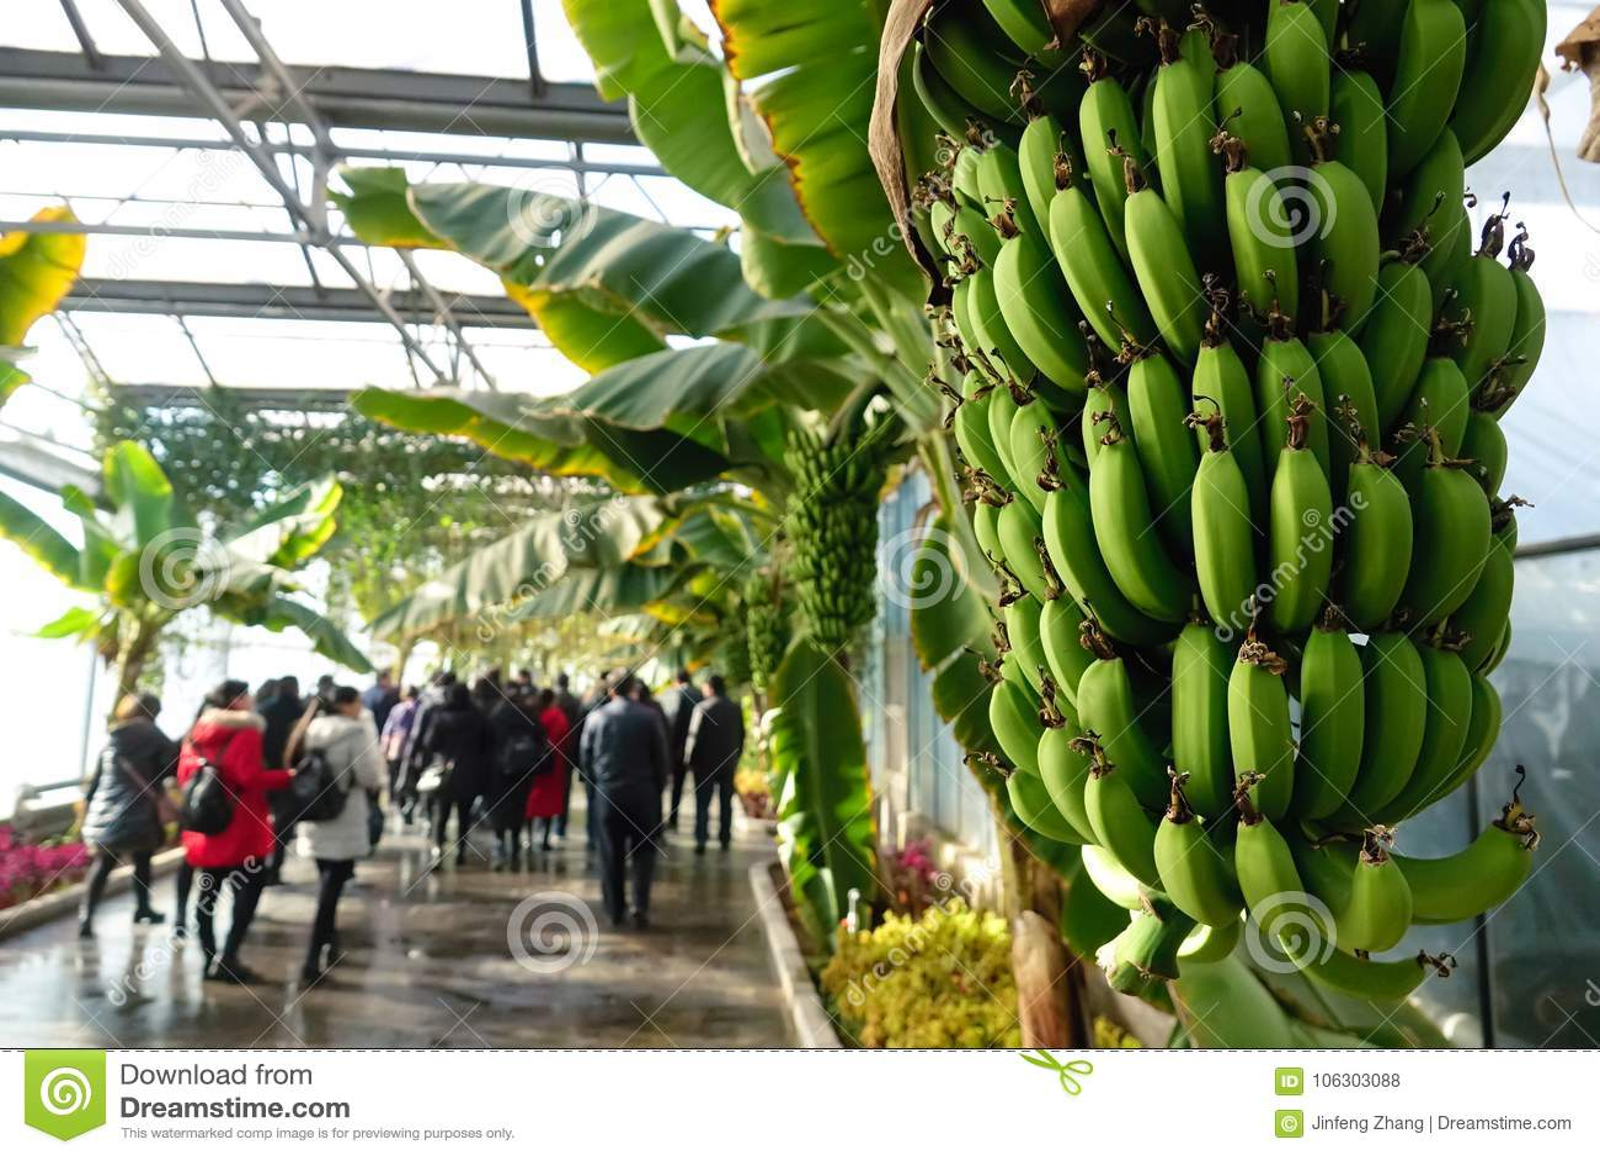 Banana Greenhouse Editorial Stock Photo Image Of Tropic 106303088